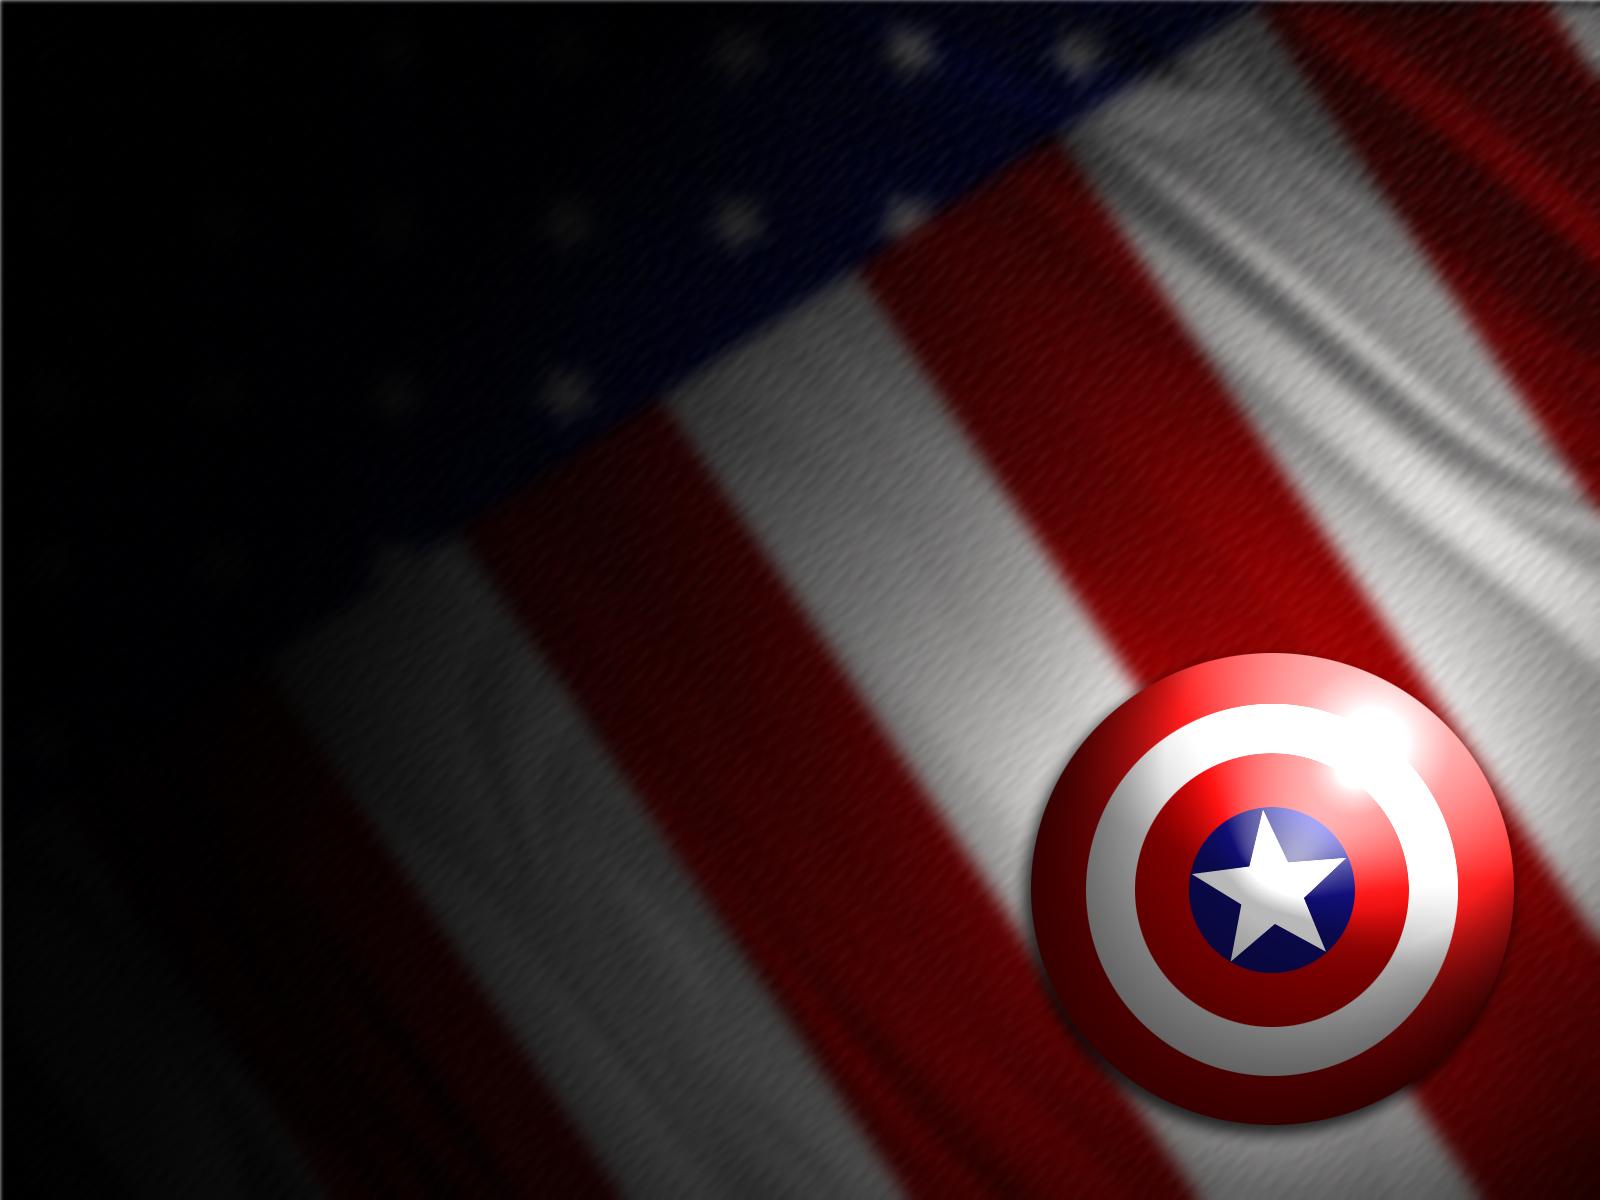 Outstanding Captain America wallpaper Captain America wallpapers 1600x1200